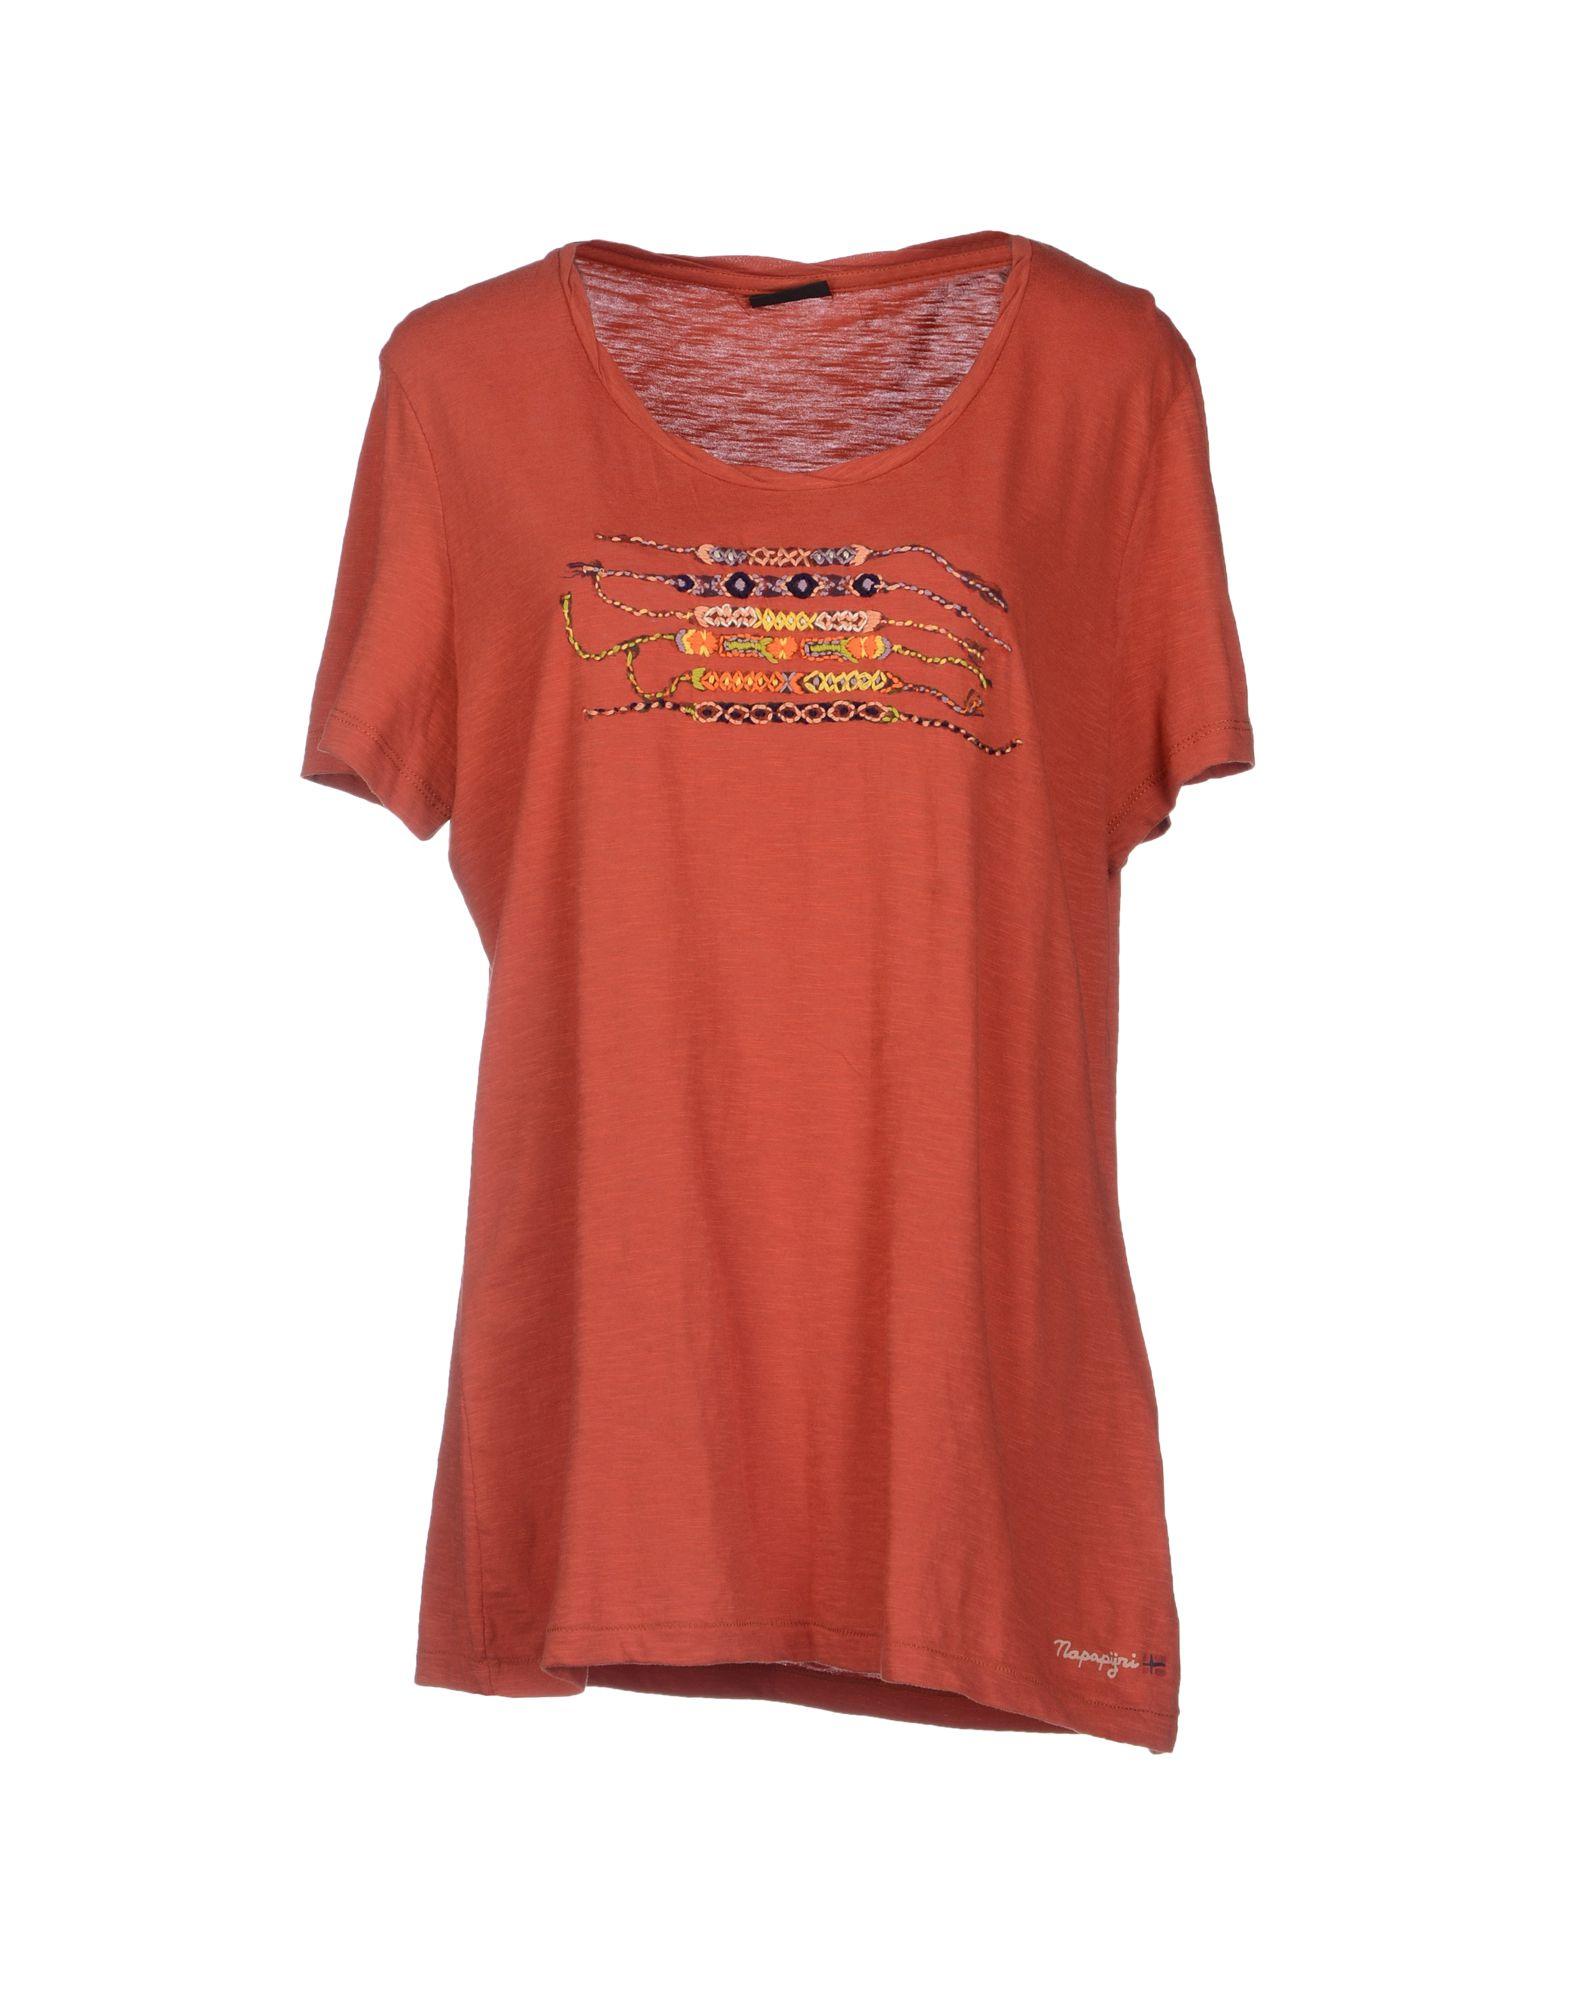 napapijri t shirt in red brick red lyst. Black Bedroom Furniture Sets. Home Design Ideas